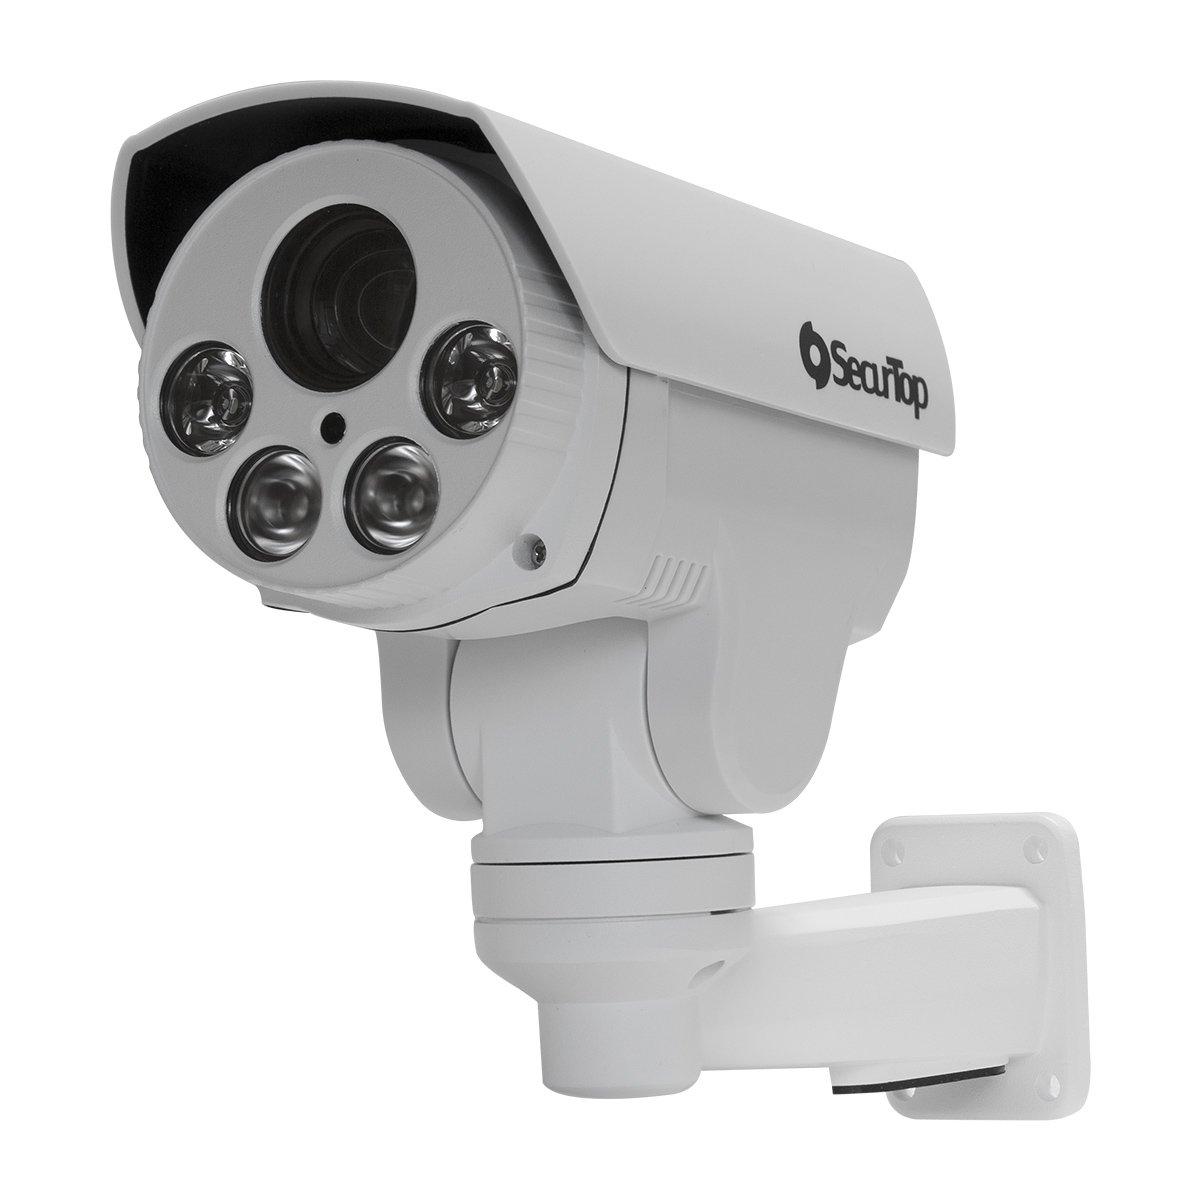 Telecamera Motorizzata - 2 Megapixel - Varifocale 5.1-51mm - 4 LED Array